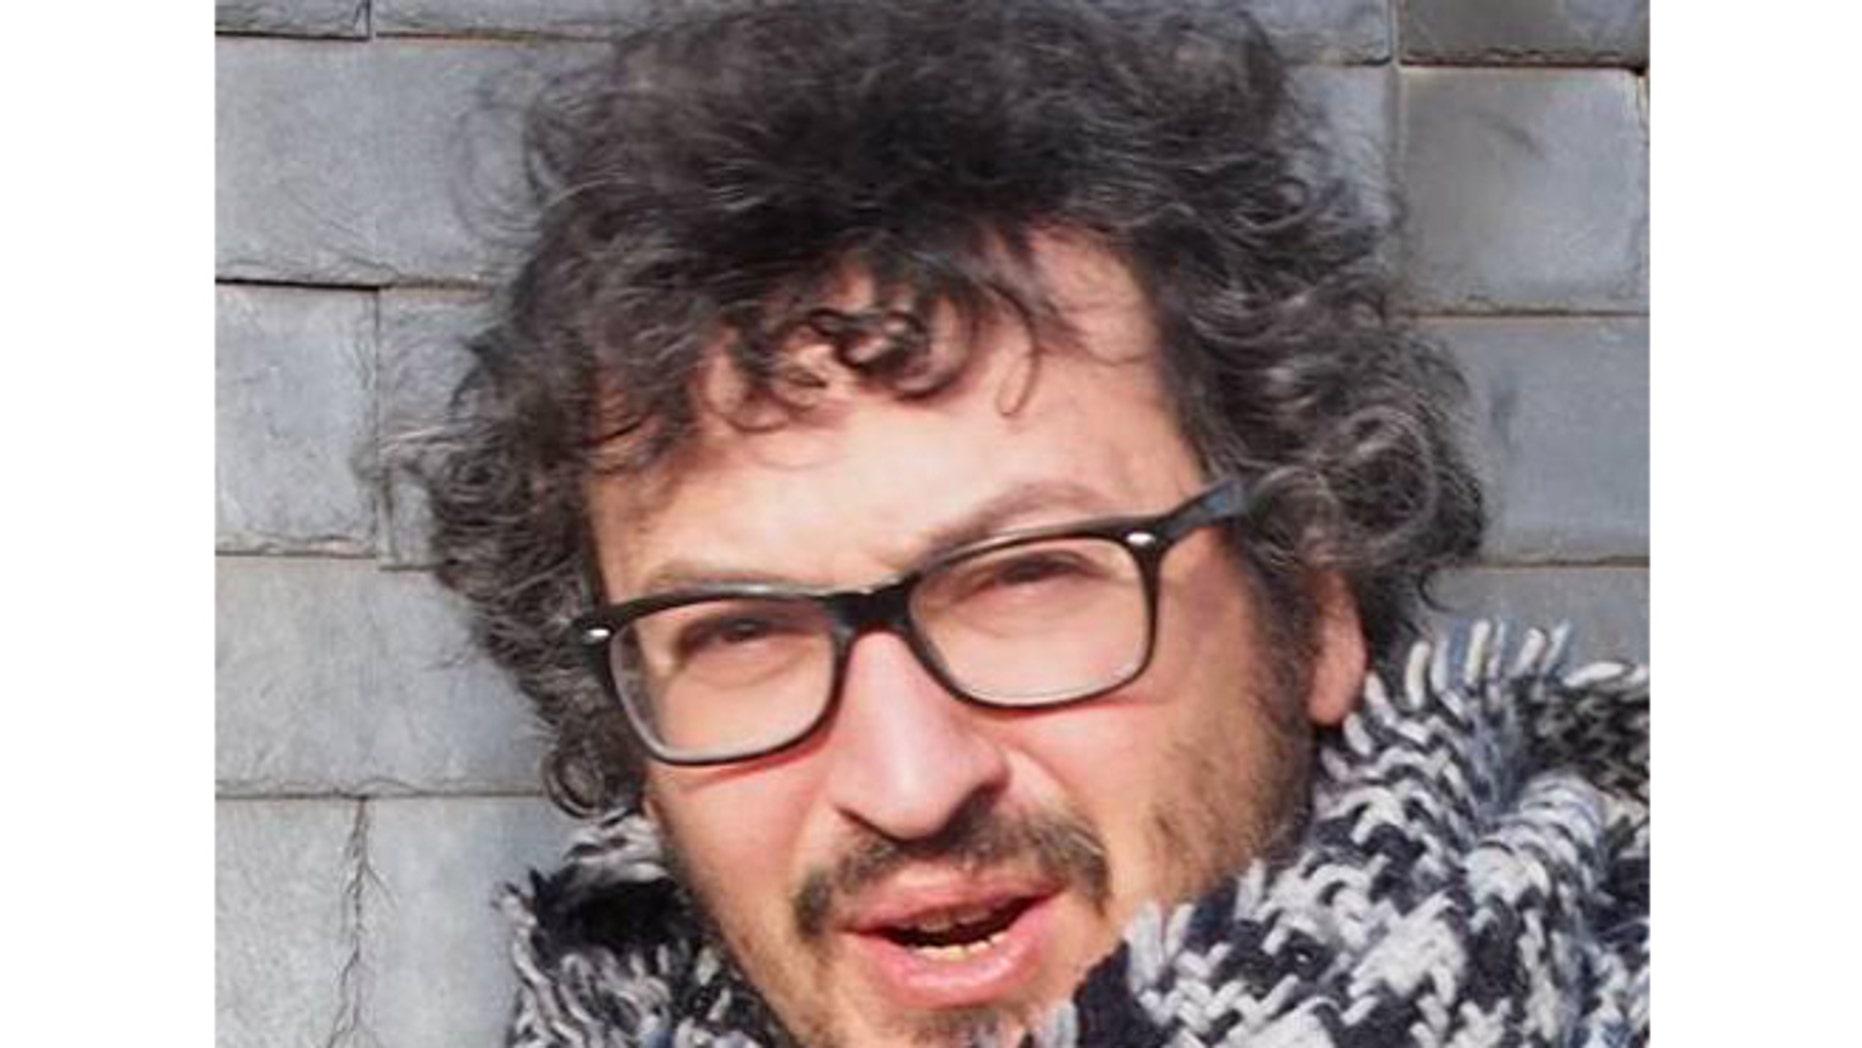 University of Pennsylvania economist Guido Menzio. (Upenn.edu)